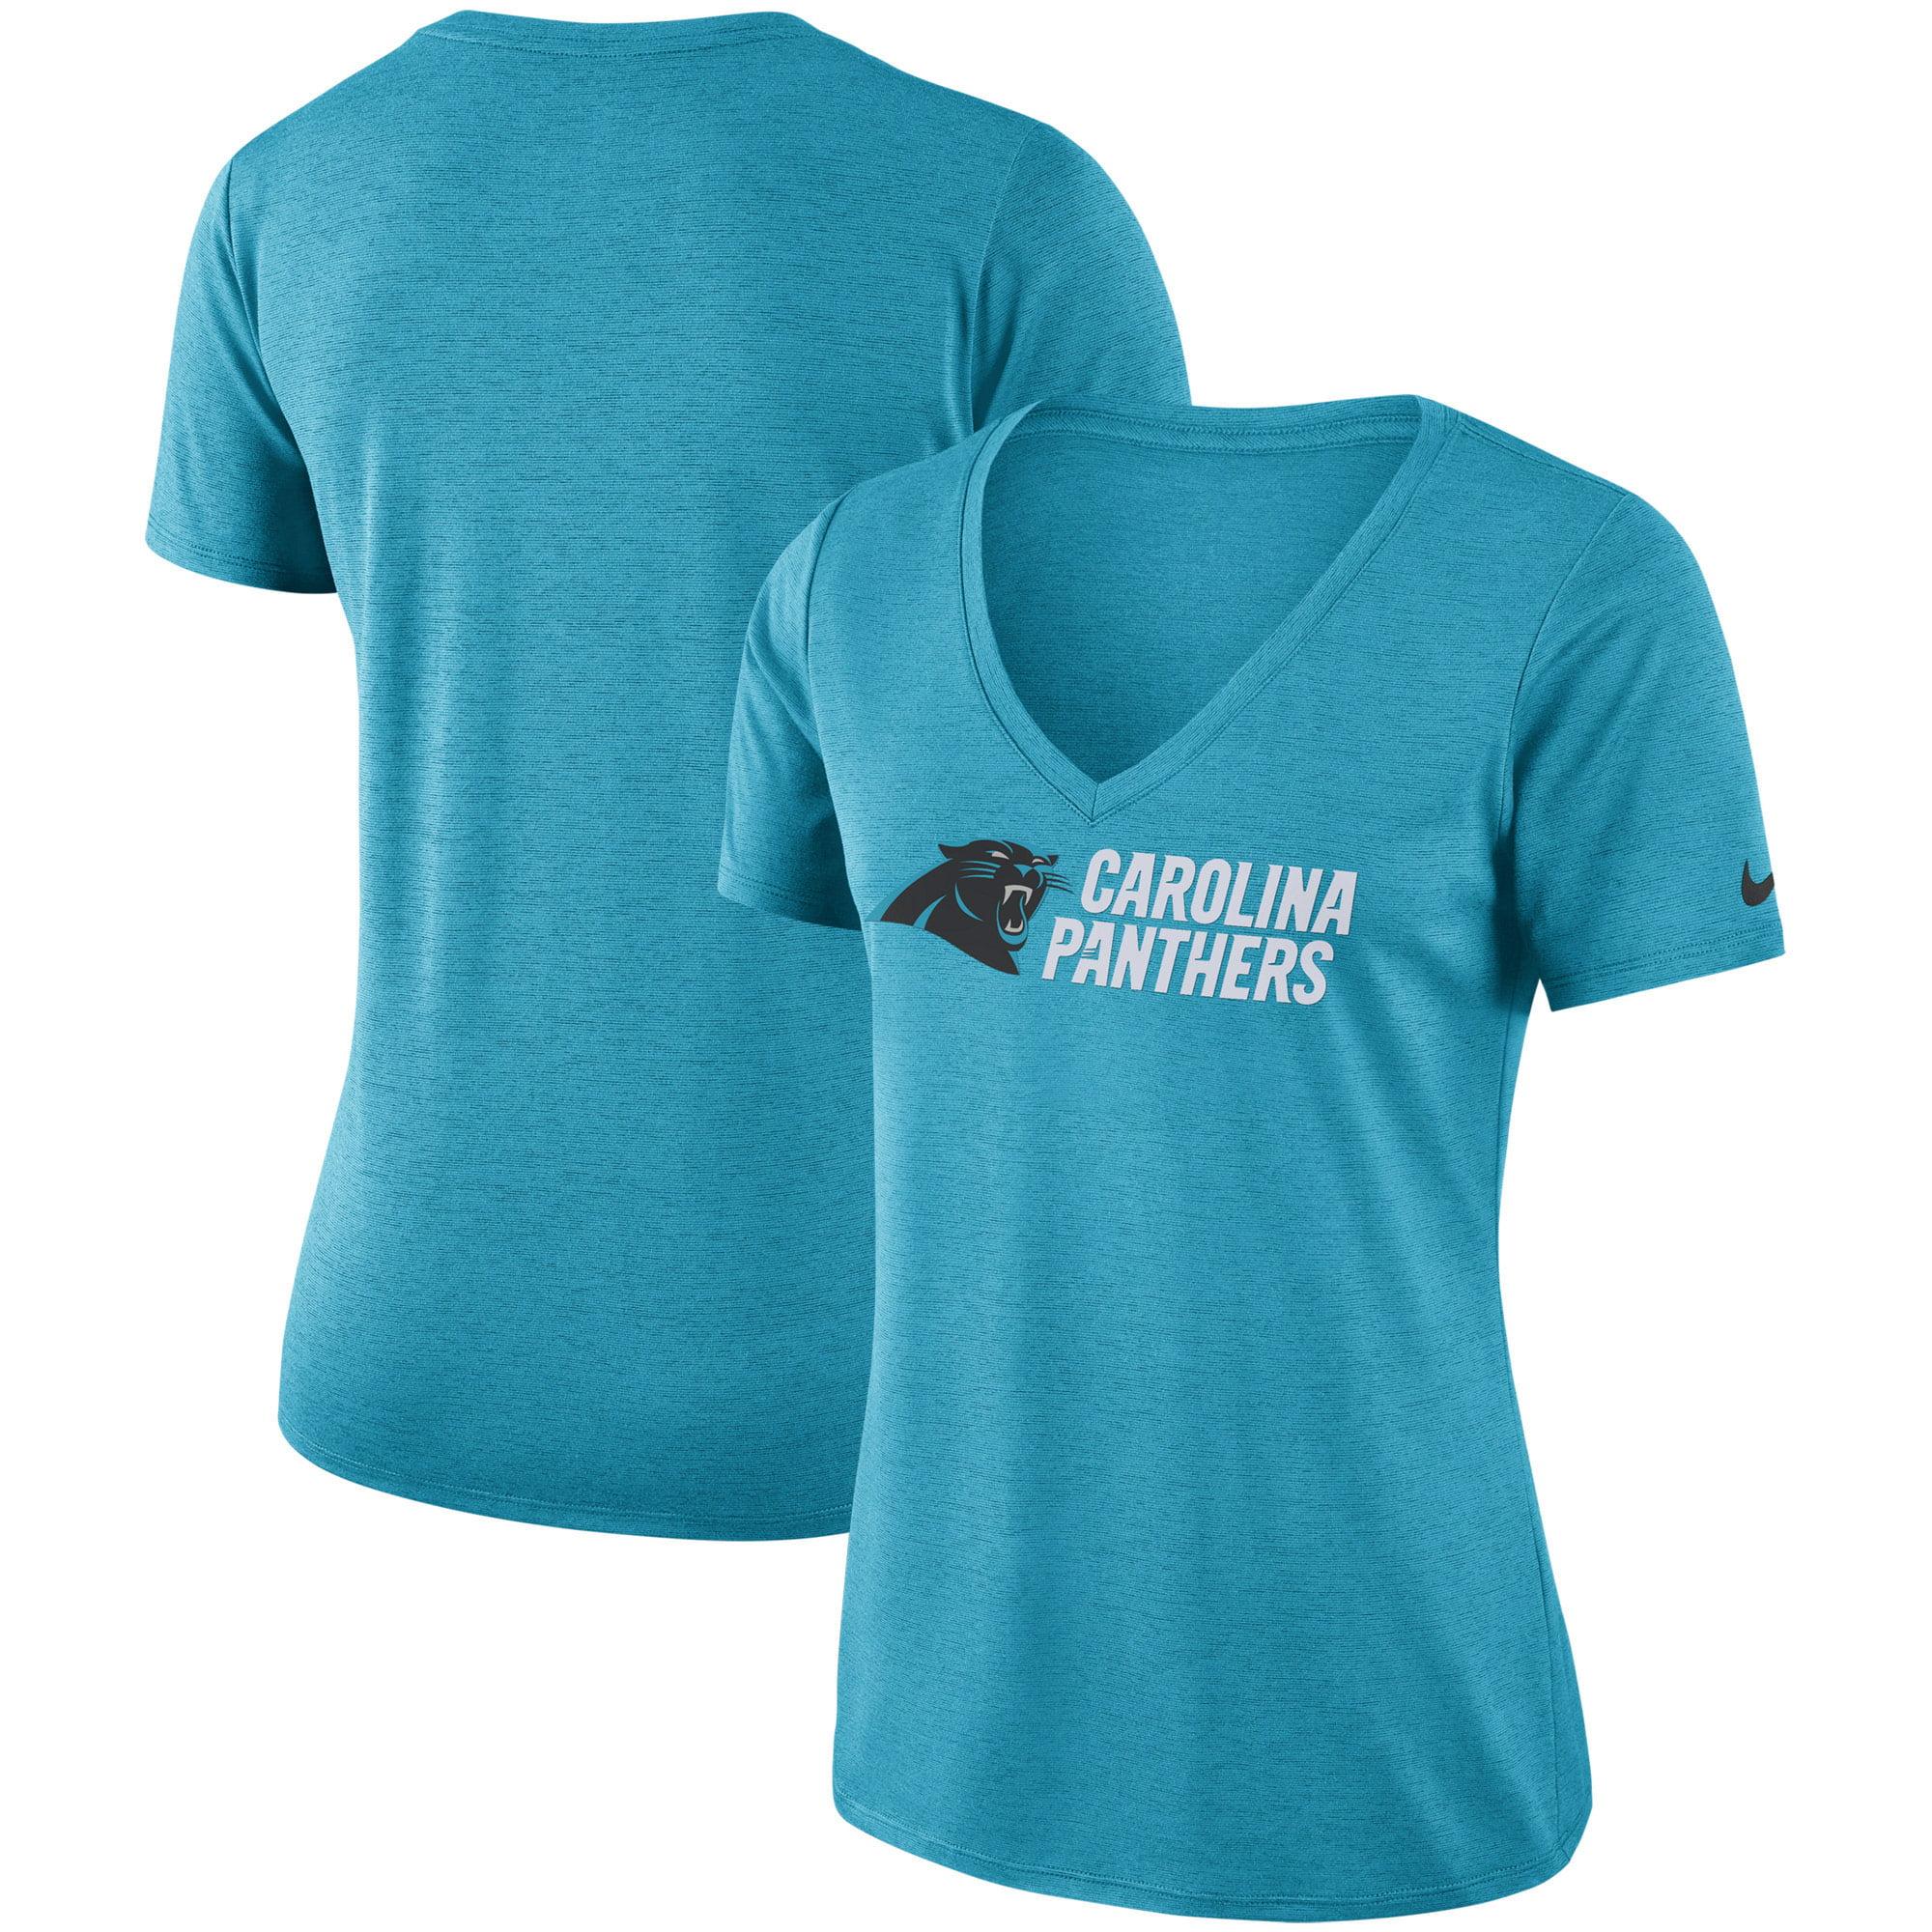 Carolina Panthers Nike Women's Performance V-Neck T-Shirt - Blue